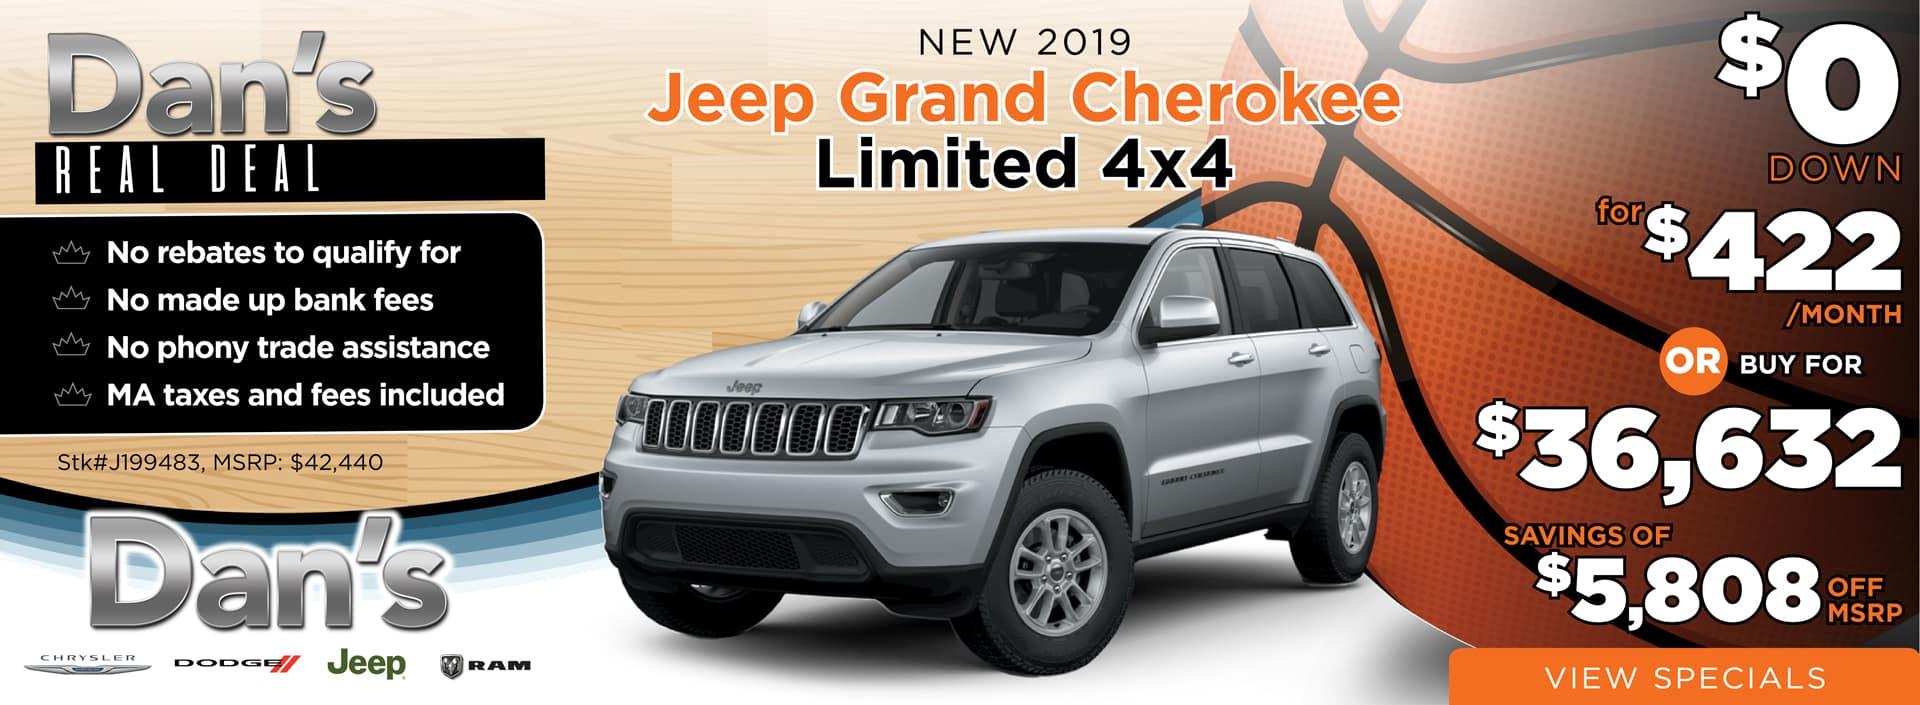 2019 Jeep_Grand Cherokee